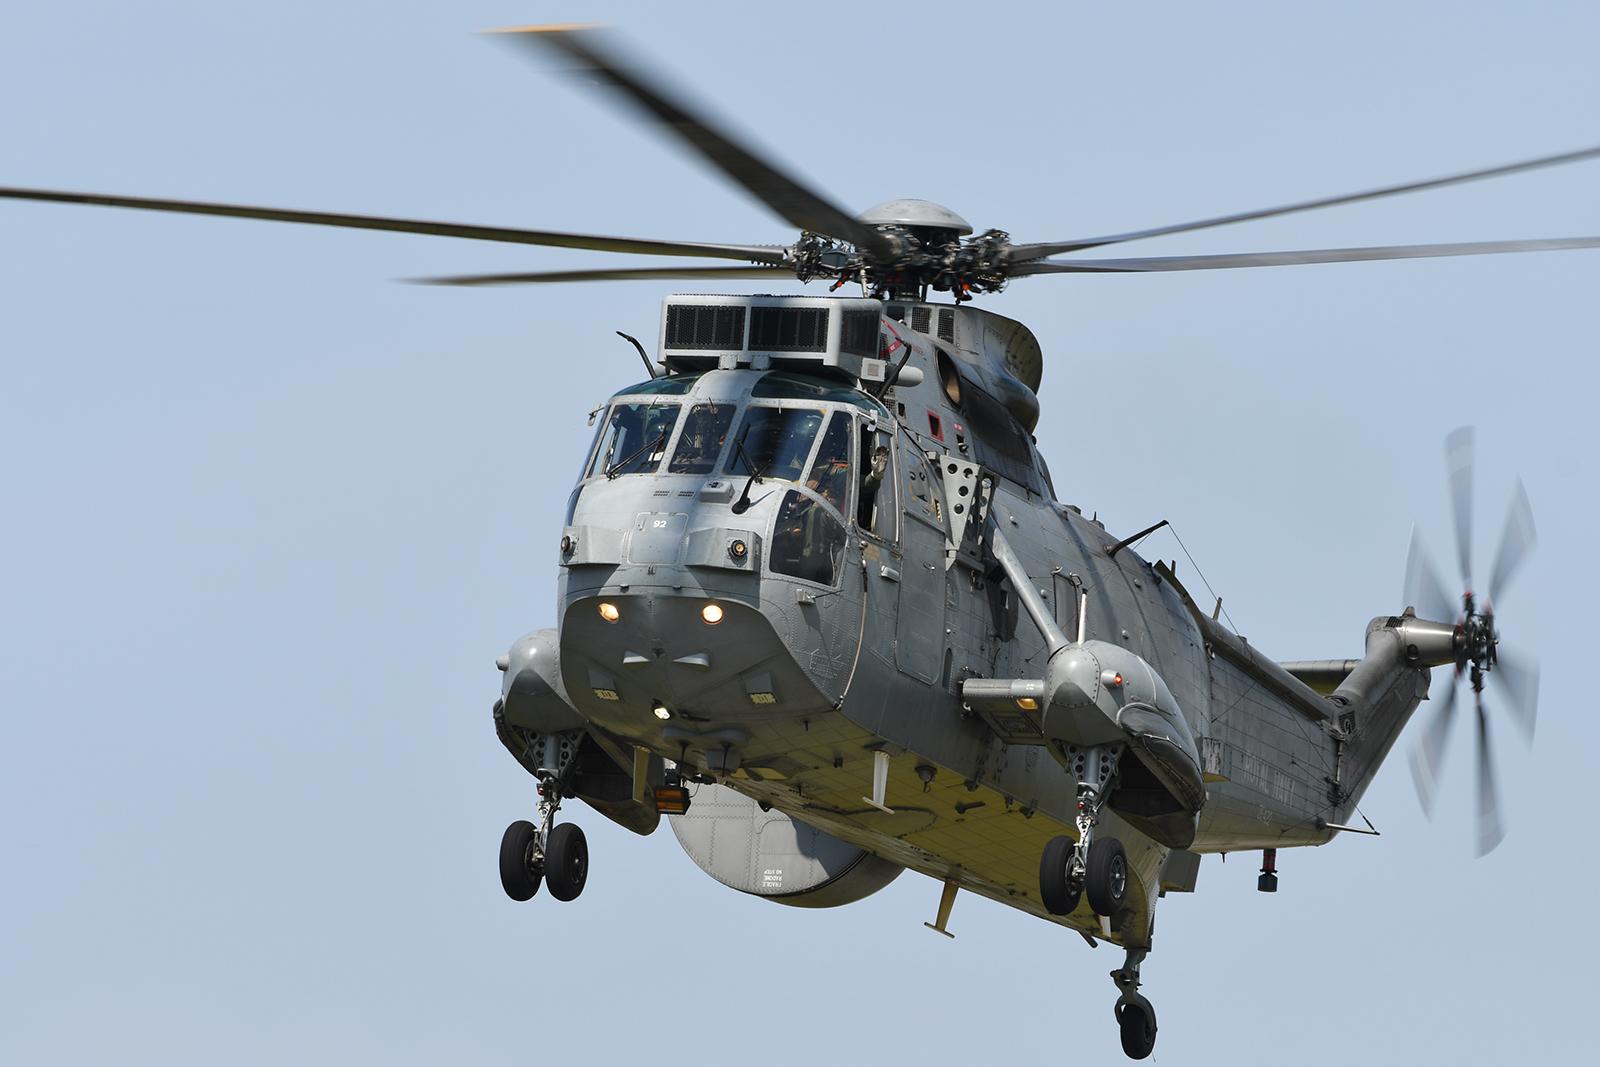 [Landivisiau] NATO Tiger Meet 2017 ZOXHZQ